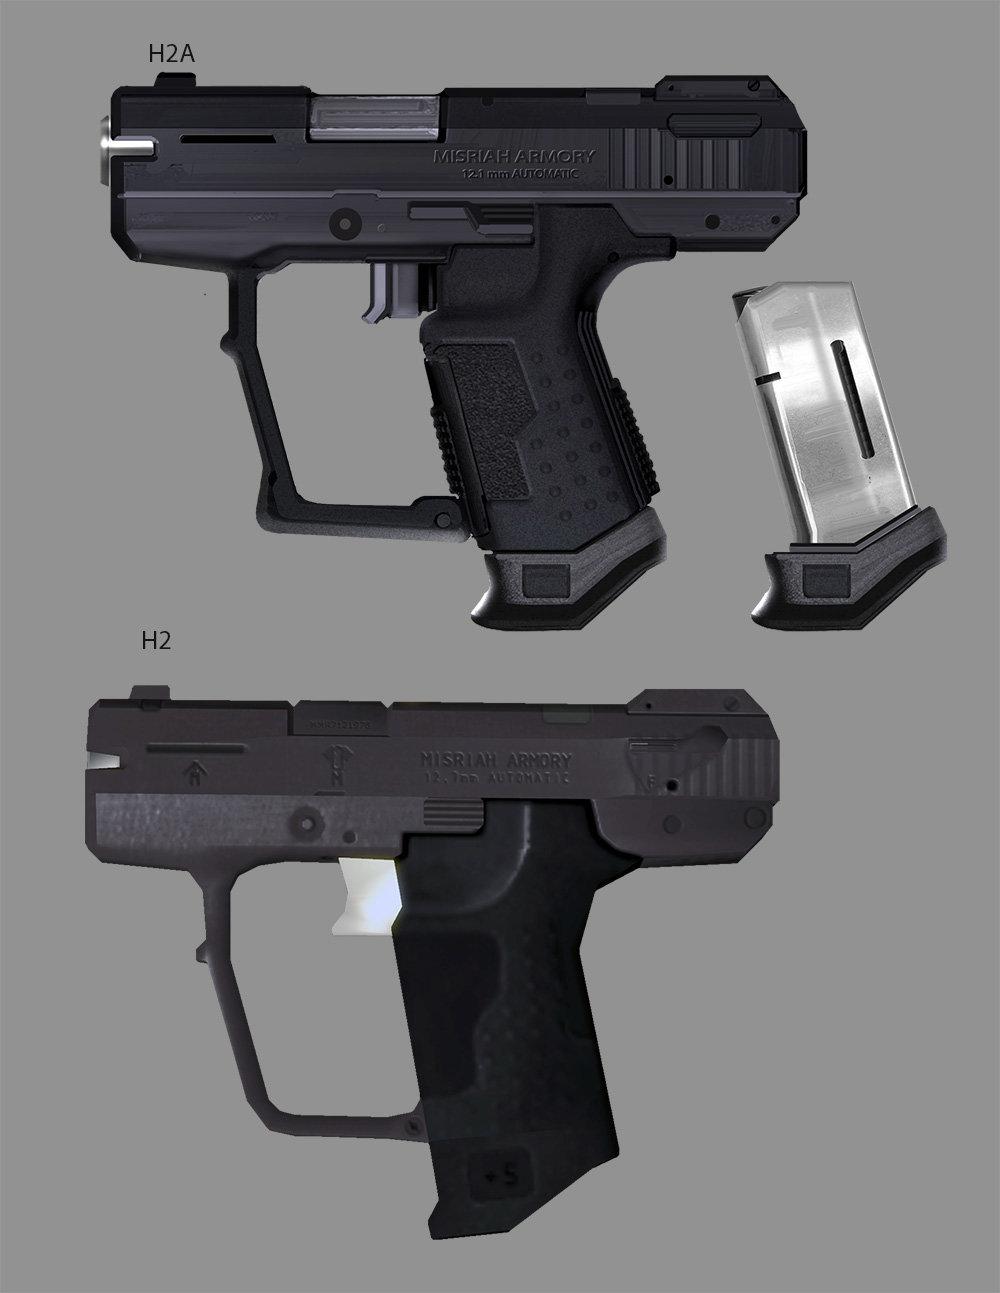 Halo 2: Anniversary Pistol update